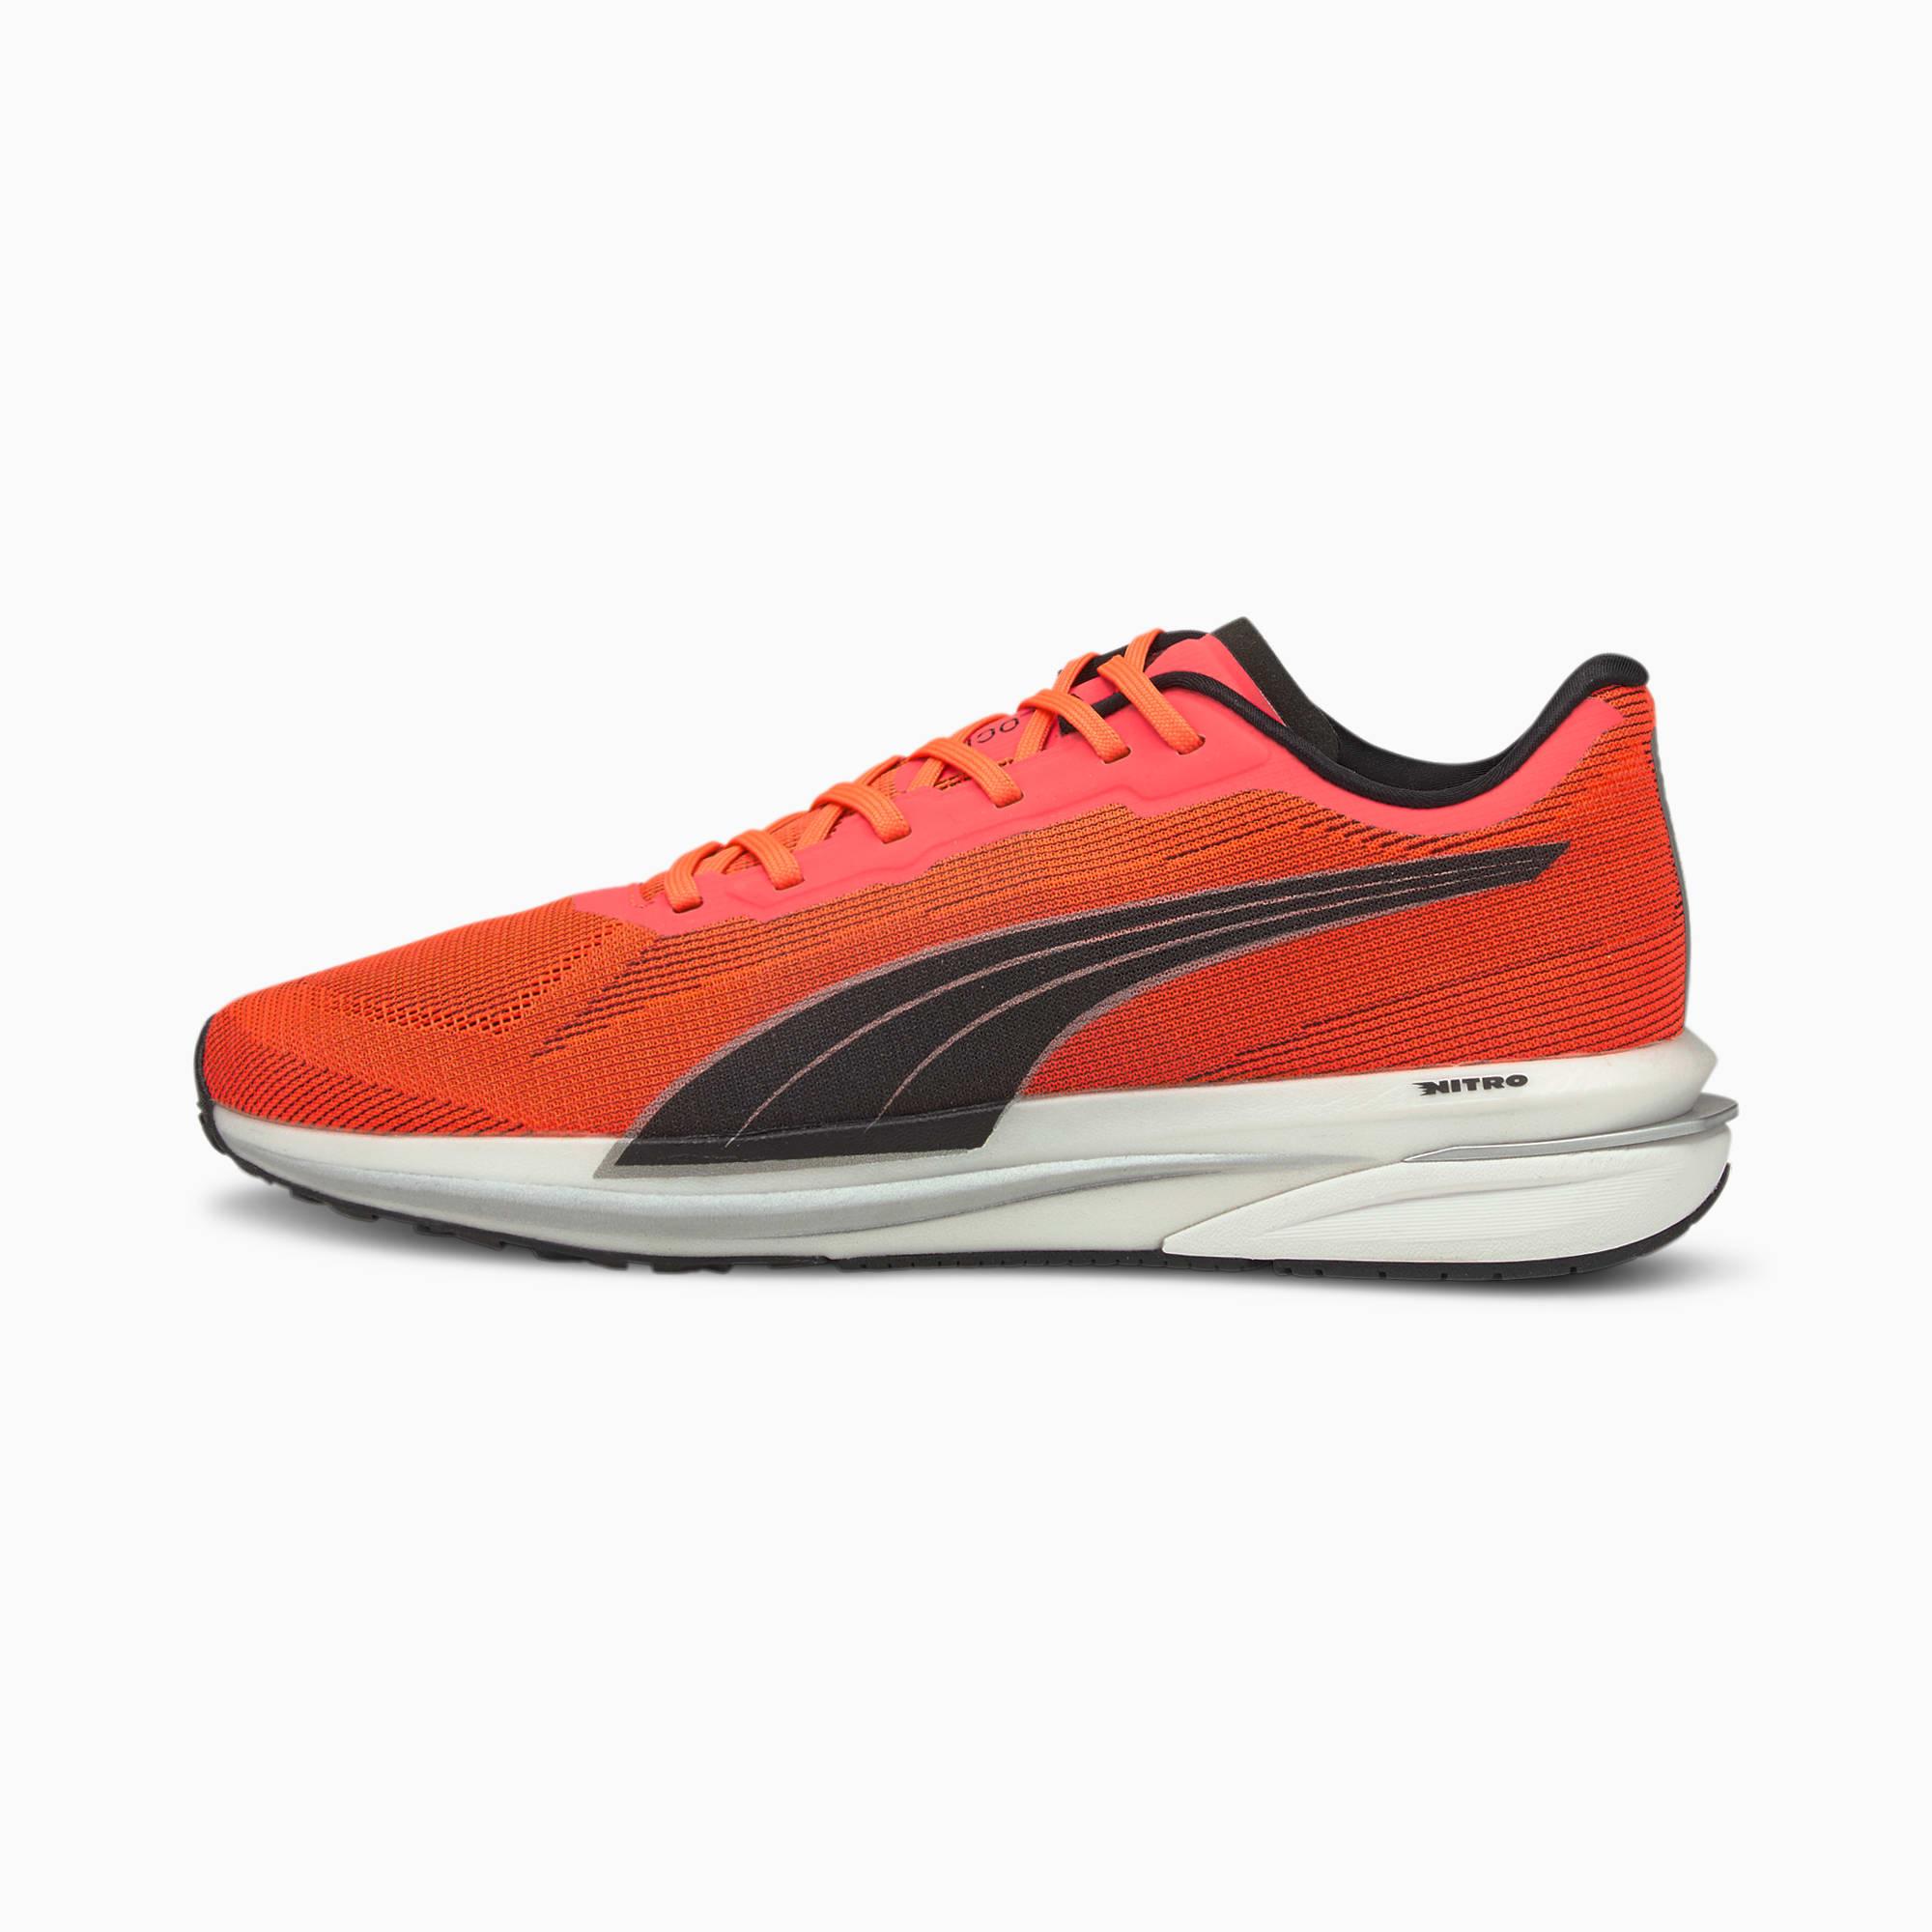 Velocity NITRO Men's Running Shoes